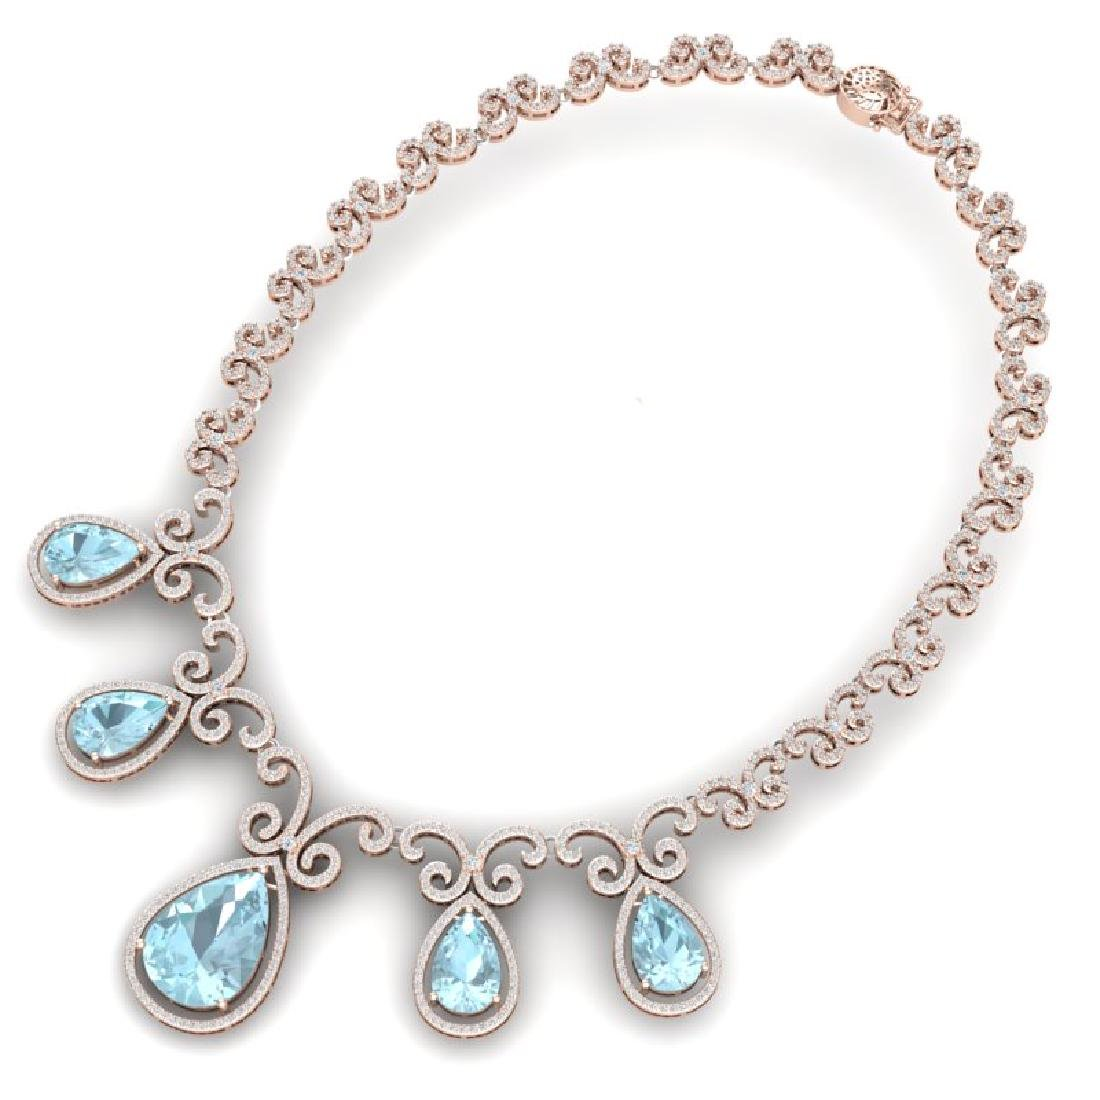 40.45 CTW Royalty Sky Topaz & VS Diamond Necklace 18K - 3